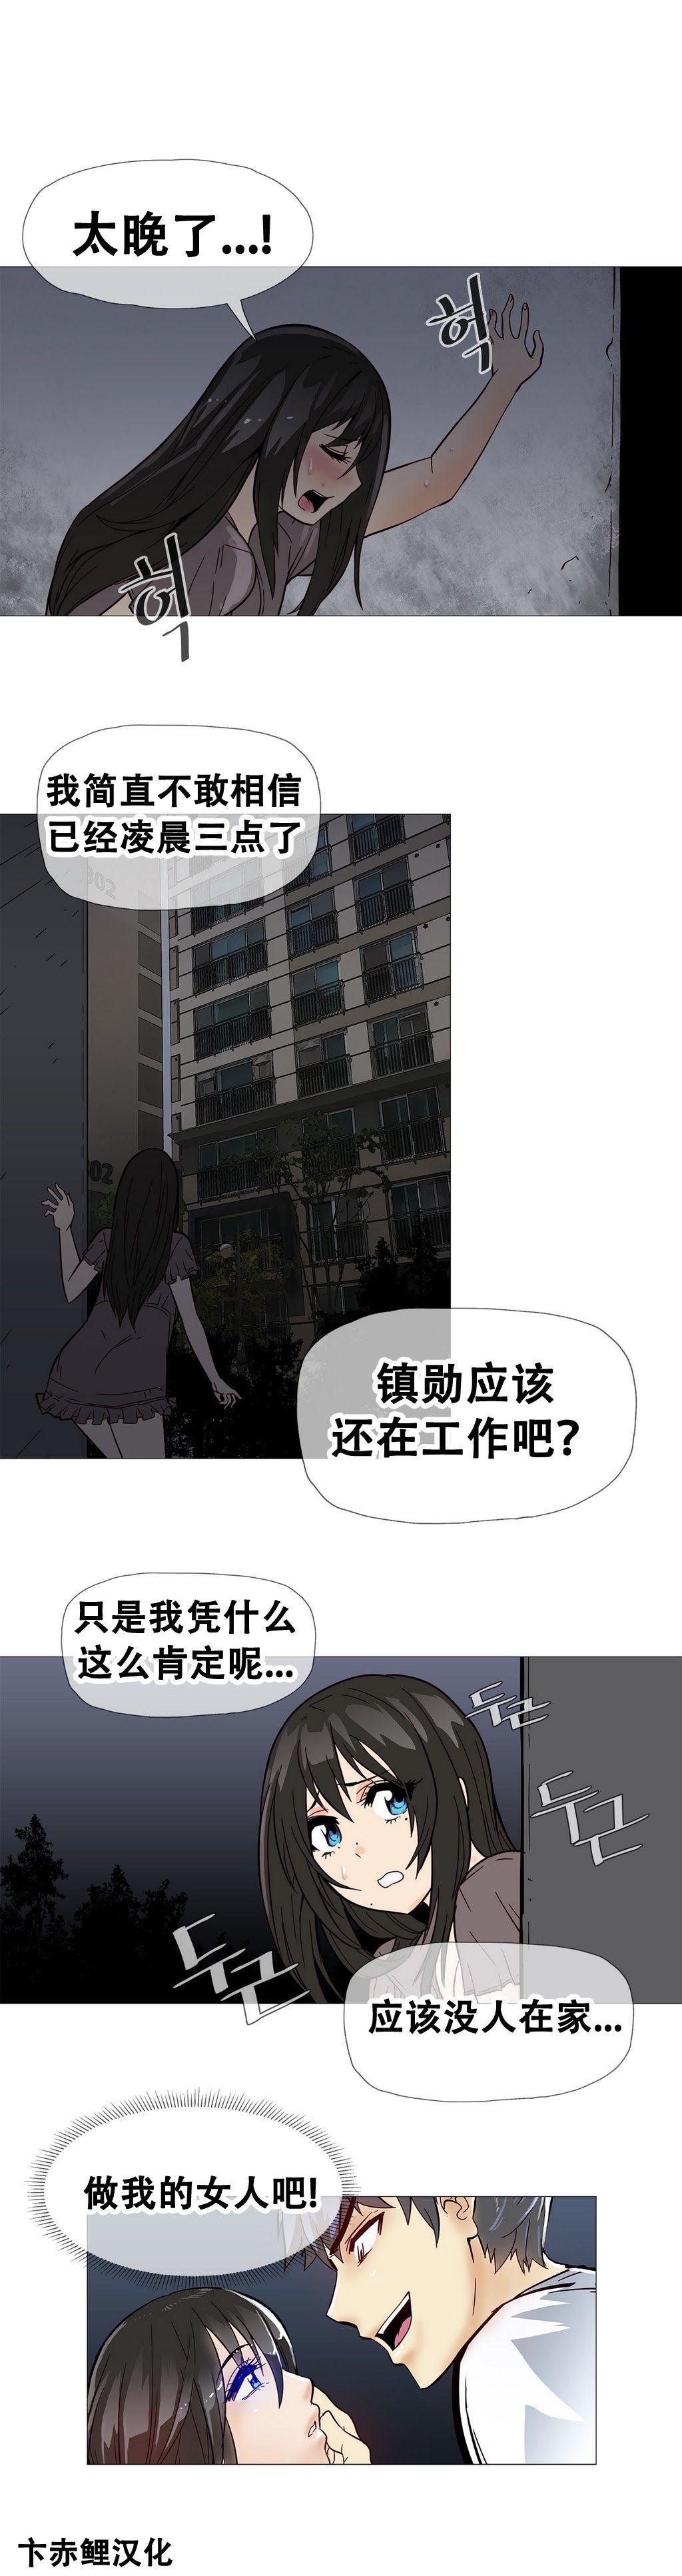 HouseHold Affairs 【卞赤鲤个人汉化】1~21话(持续更新中) 218